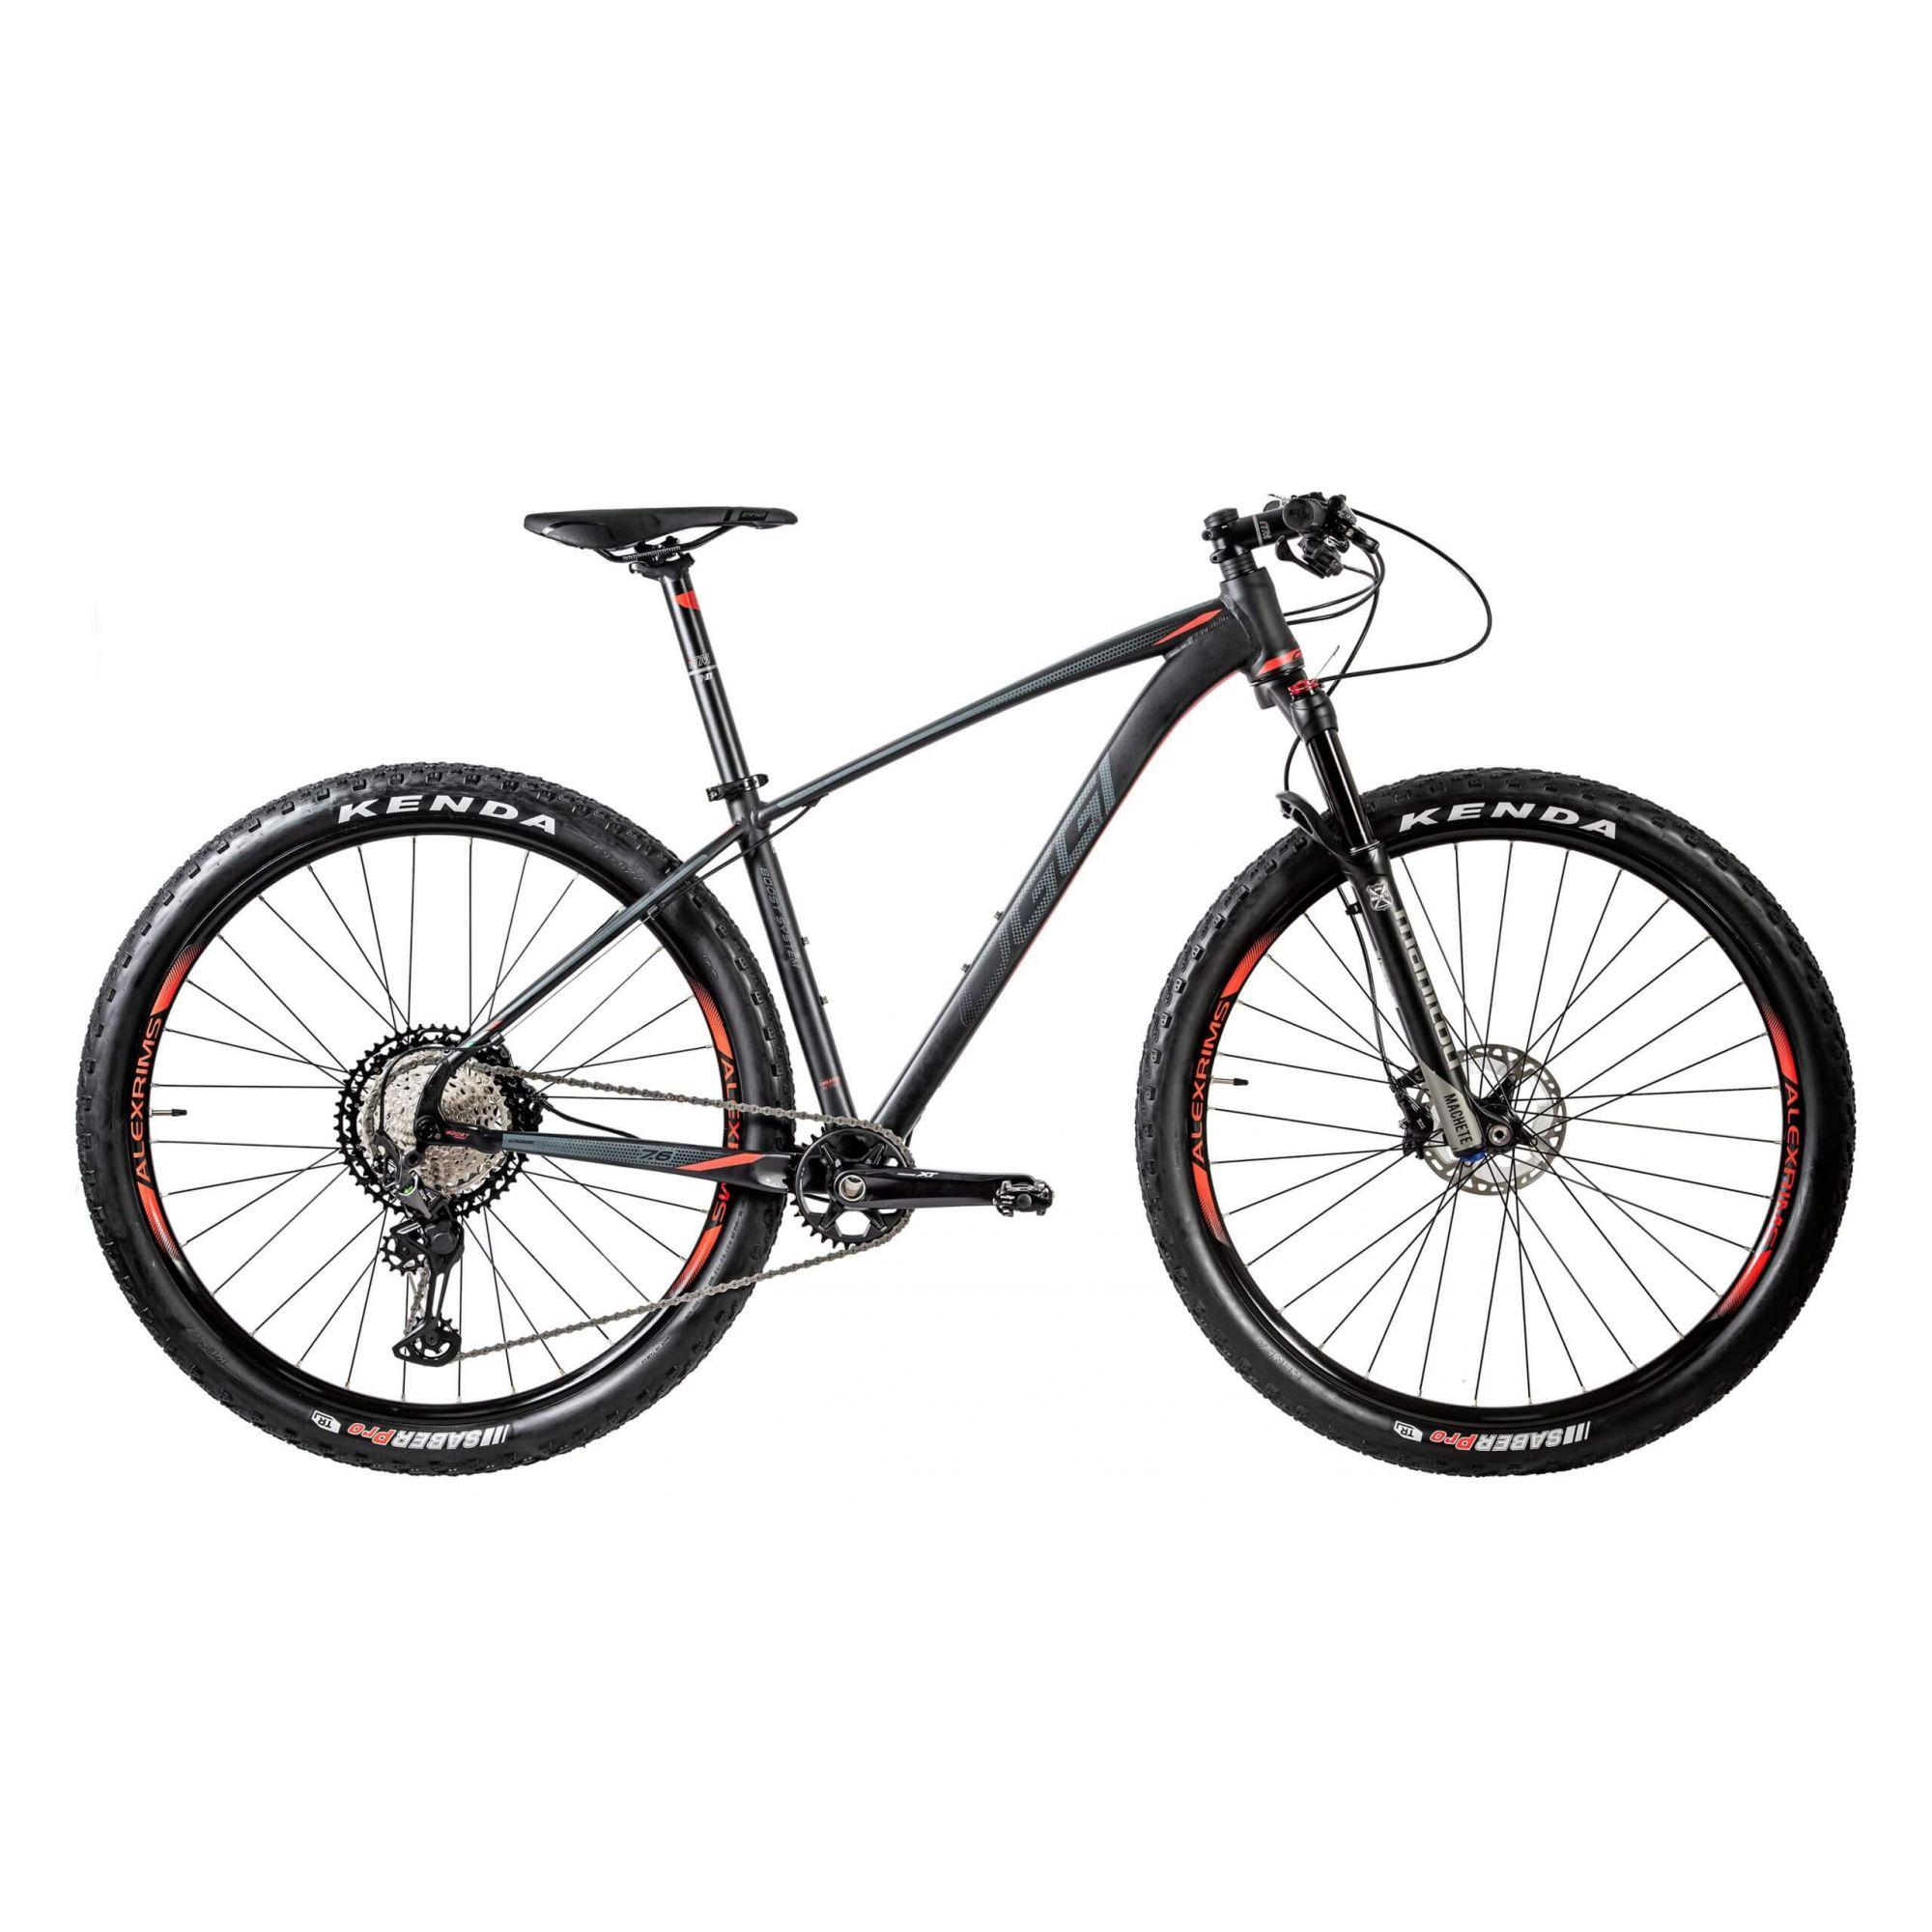 "Bicicleta 29"" OGGI Big Wheel 7.6 2020 preta/vermelha"